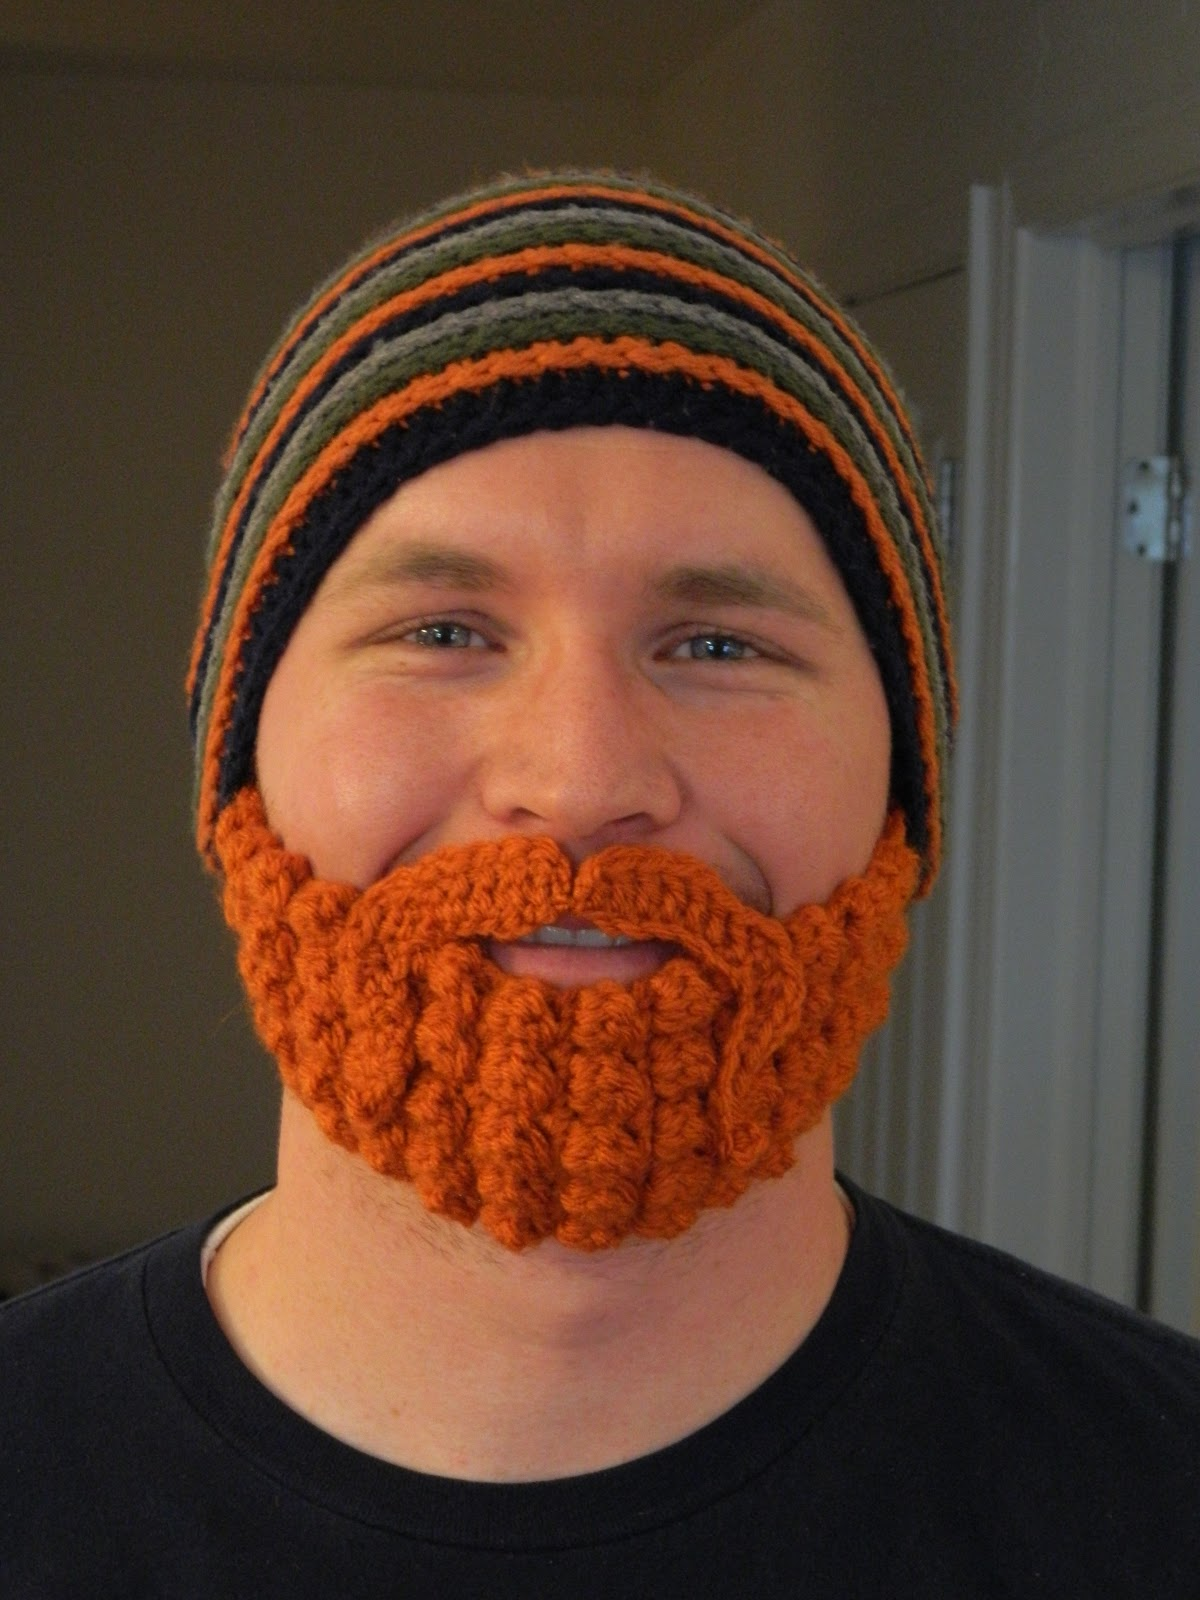 Crochet Pattern Mustache Hat : The Worsted Crochet Blog: December 2012